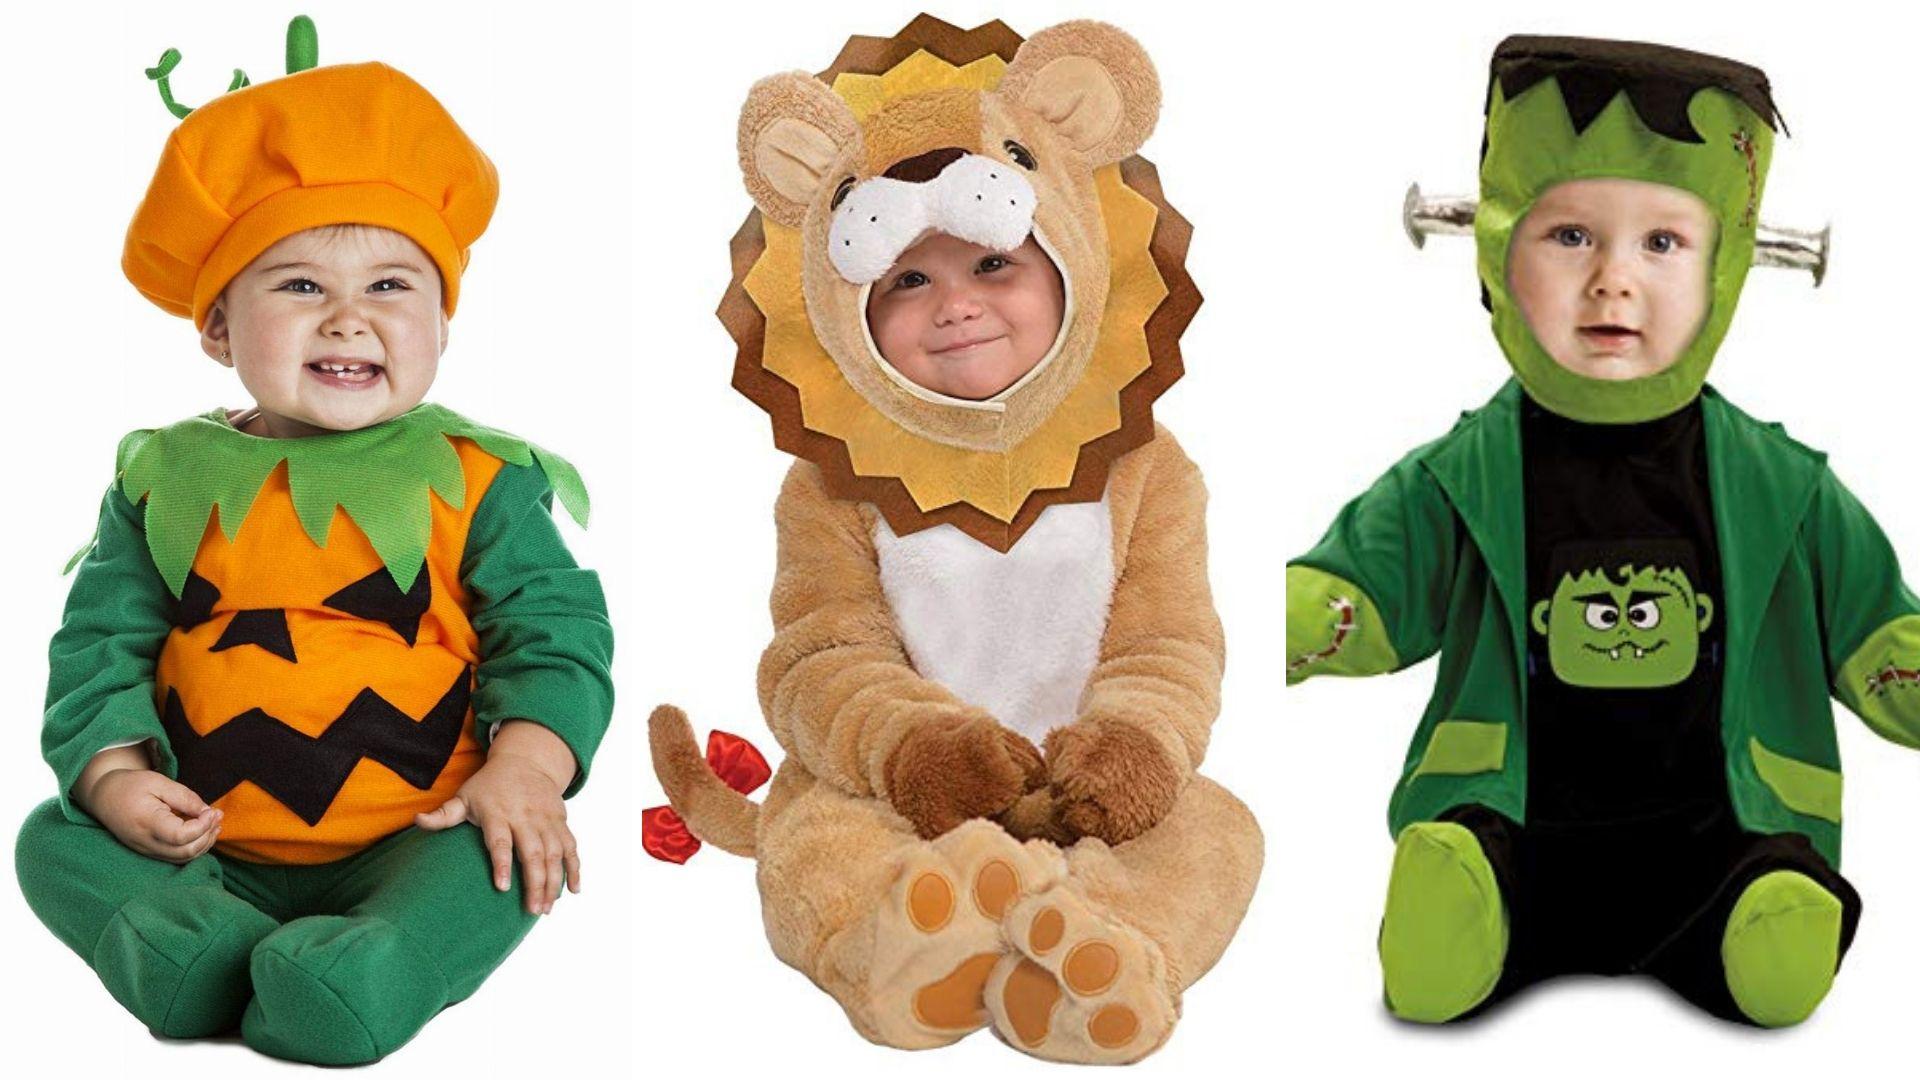 Disfraces para bebes de calabaza, león o frankenstein.